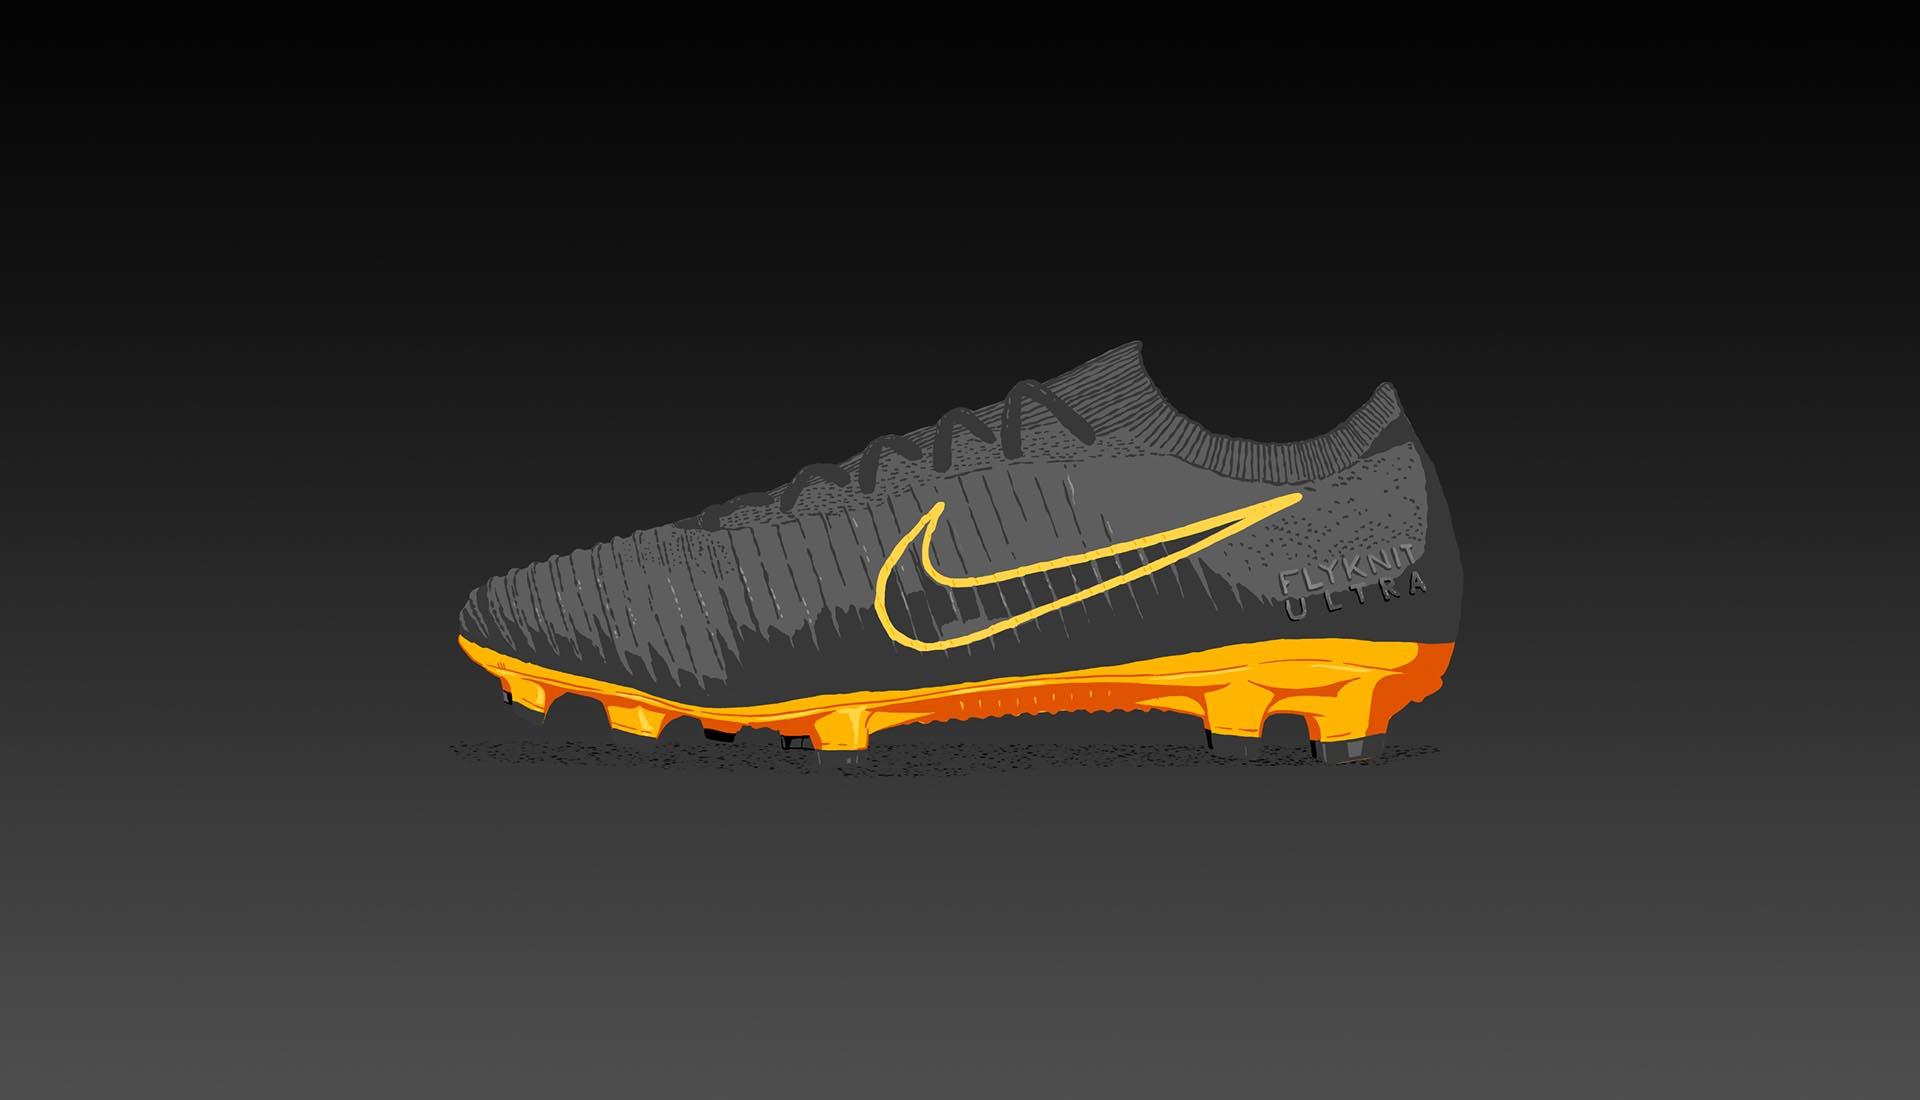 buy popular 82d23 2832a Watch Him Weave | SoccerBible x ilovedust x Eden Hazard ...